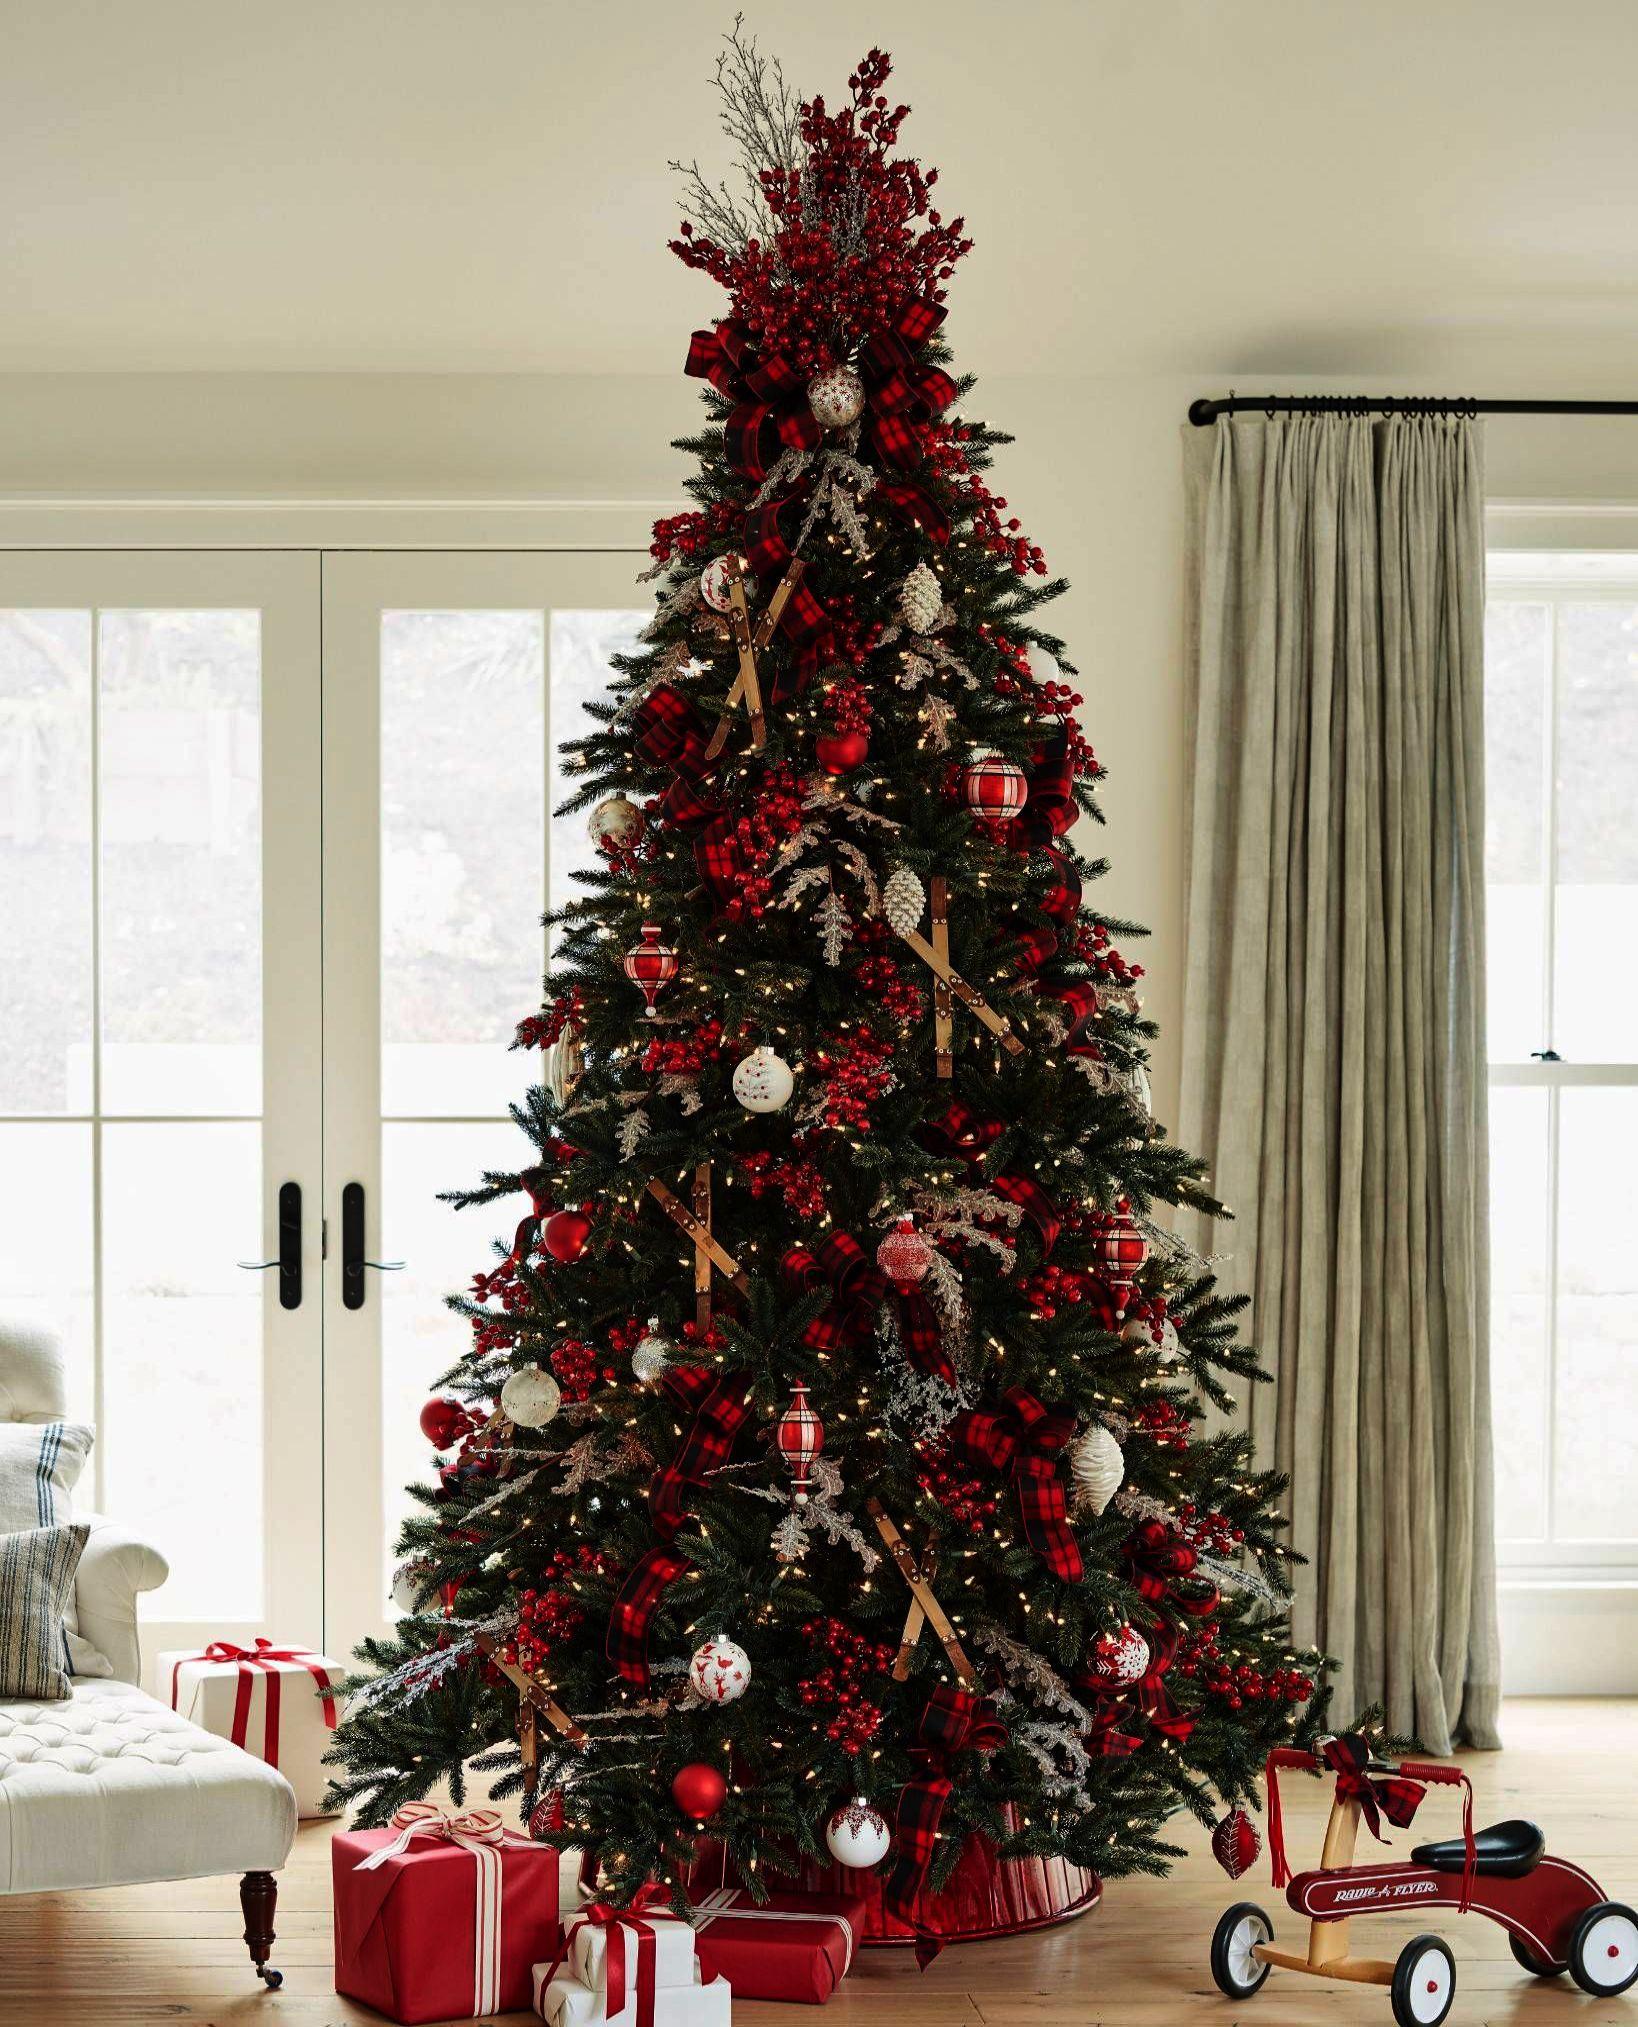 Christmas Tree Skirt Pier 1 Neither Christmas Island Jobs Serco Red Christmas Decor Rustic Christmas Tree Beautiful Christmas